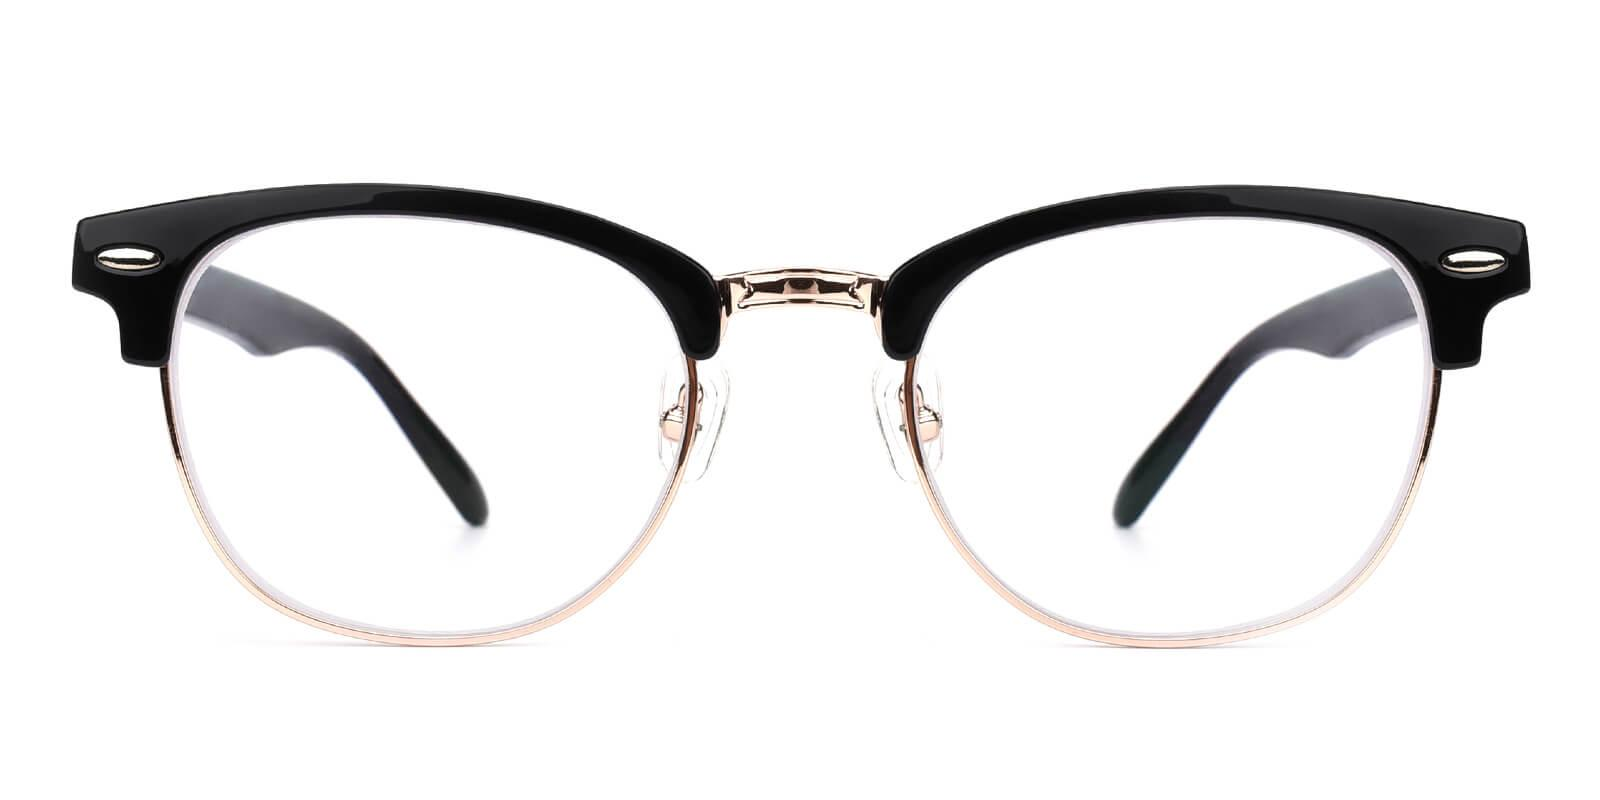 Ancient-Black-Browline-Metal-Eyeglasses-additional2